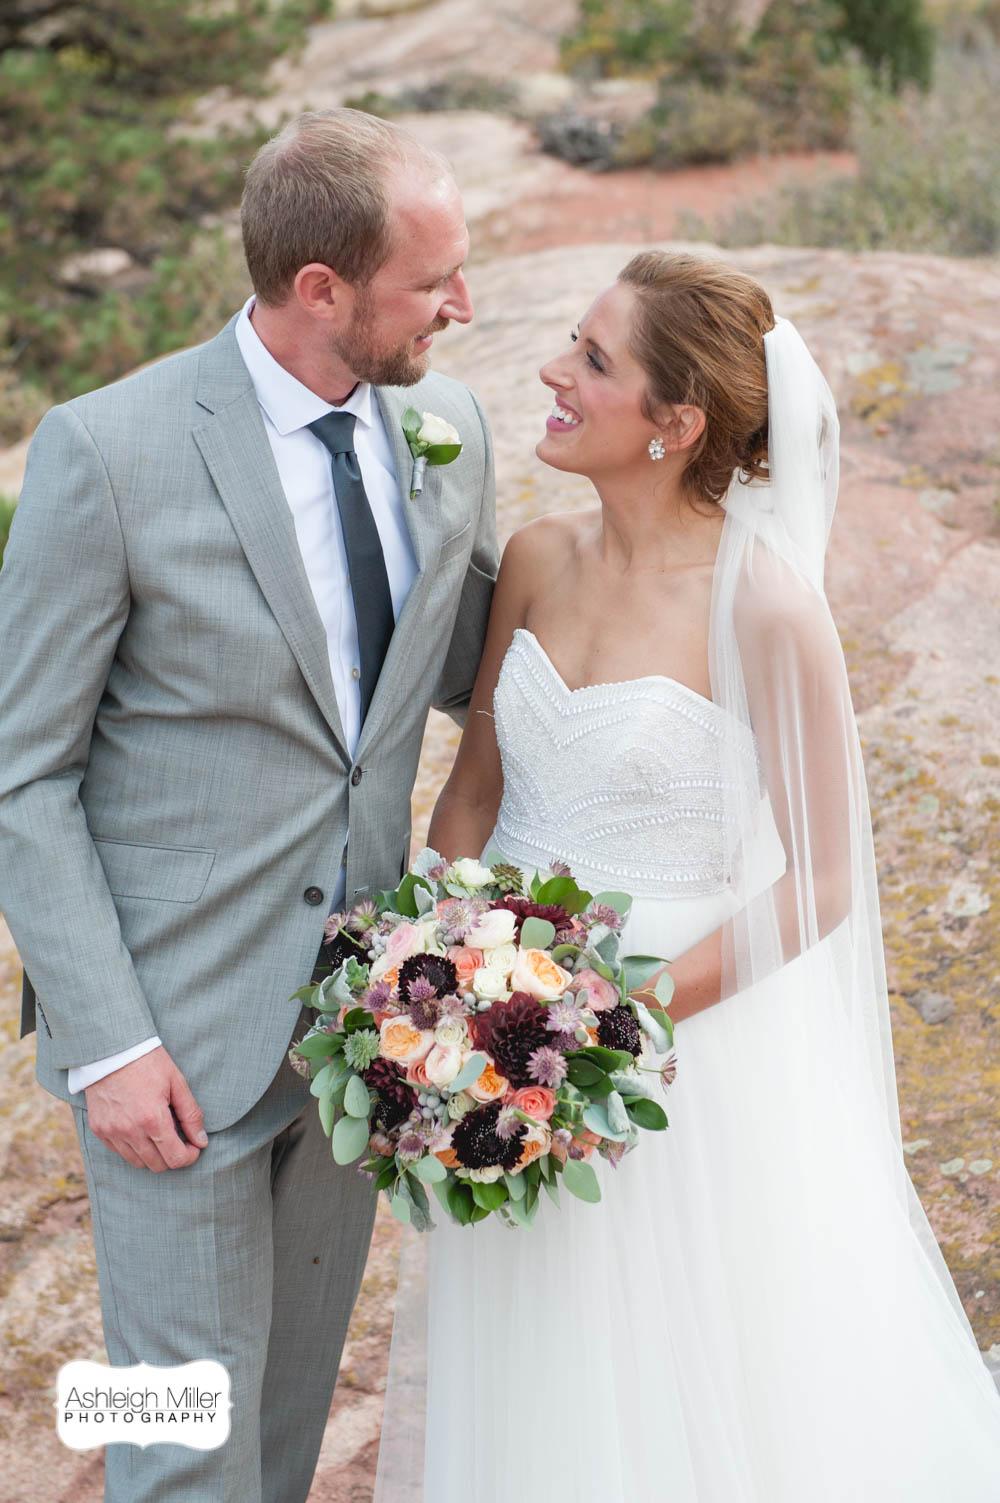 AMW-Wedding-EmilyRyan-WillowRidgeManor-4209-Blog.jpg